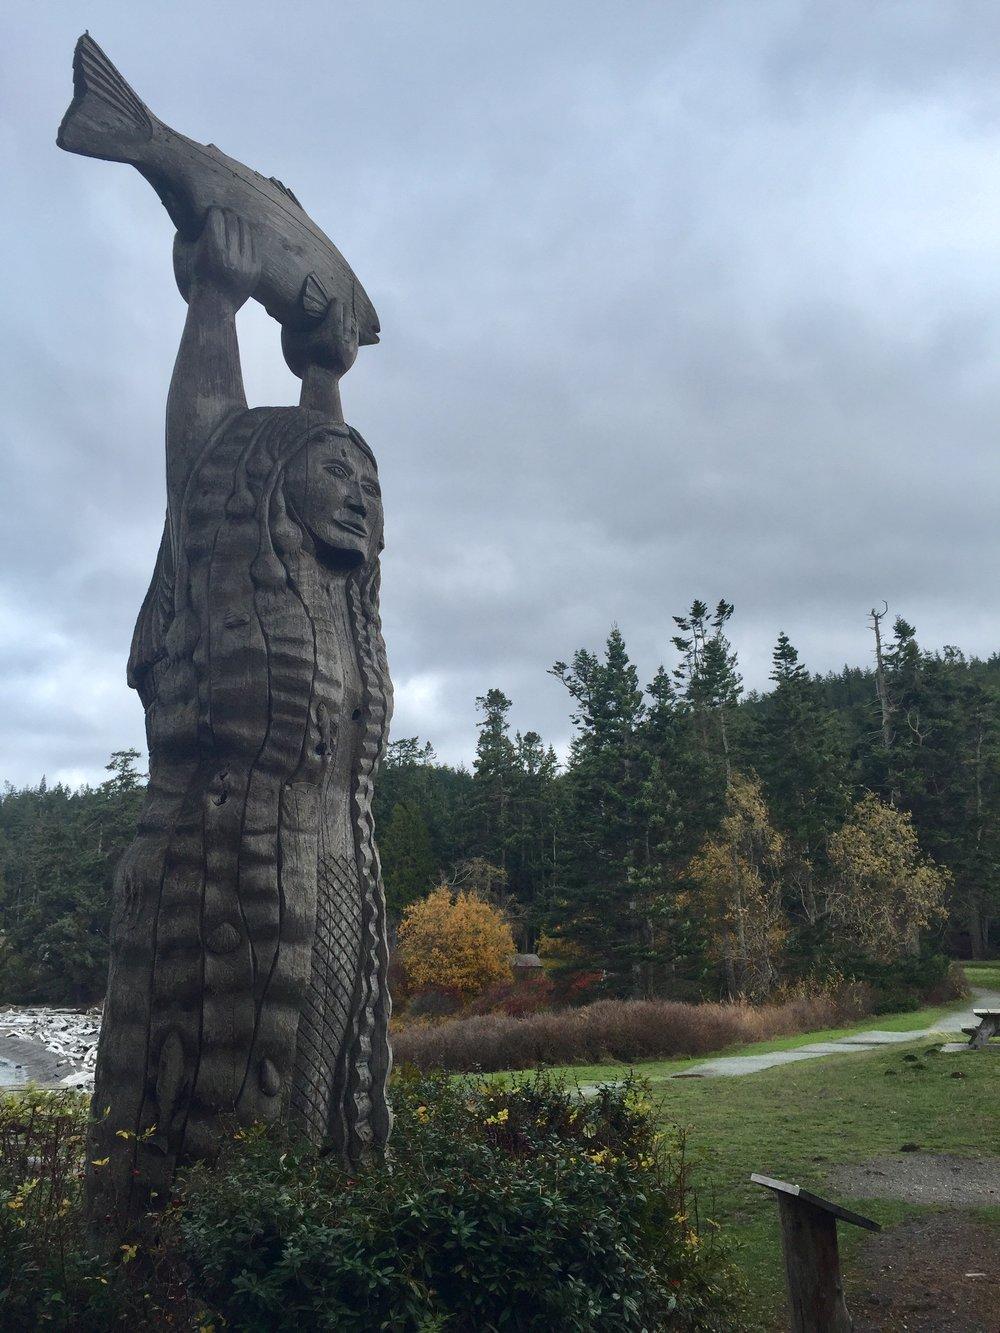 Kwuh-kwal-uhl-wut aka the Deception Pass Maiden near Rosario Head on Fidalgo Island. 11/16/17